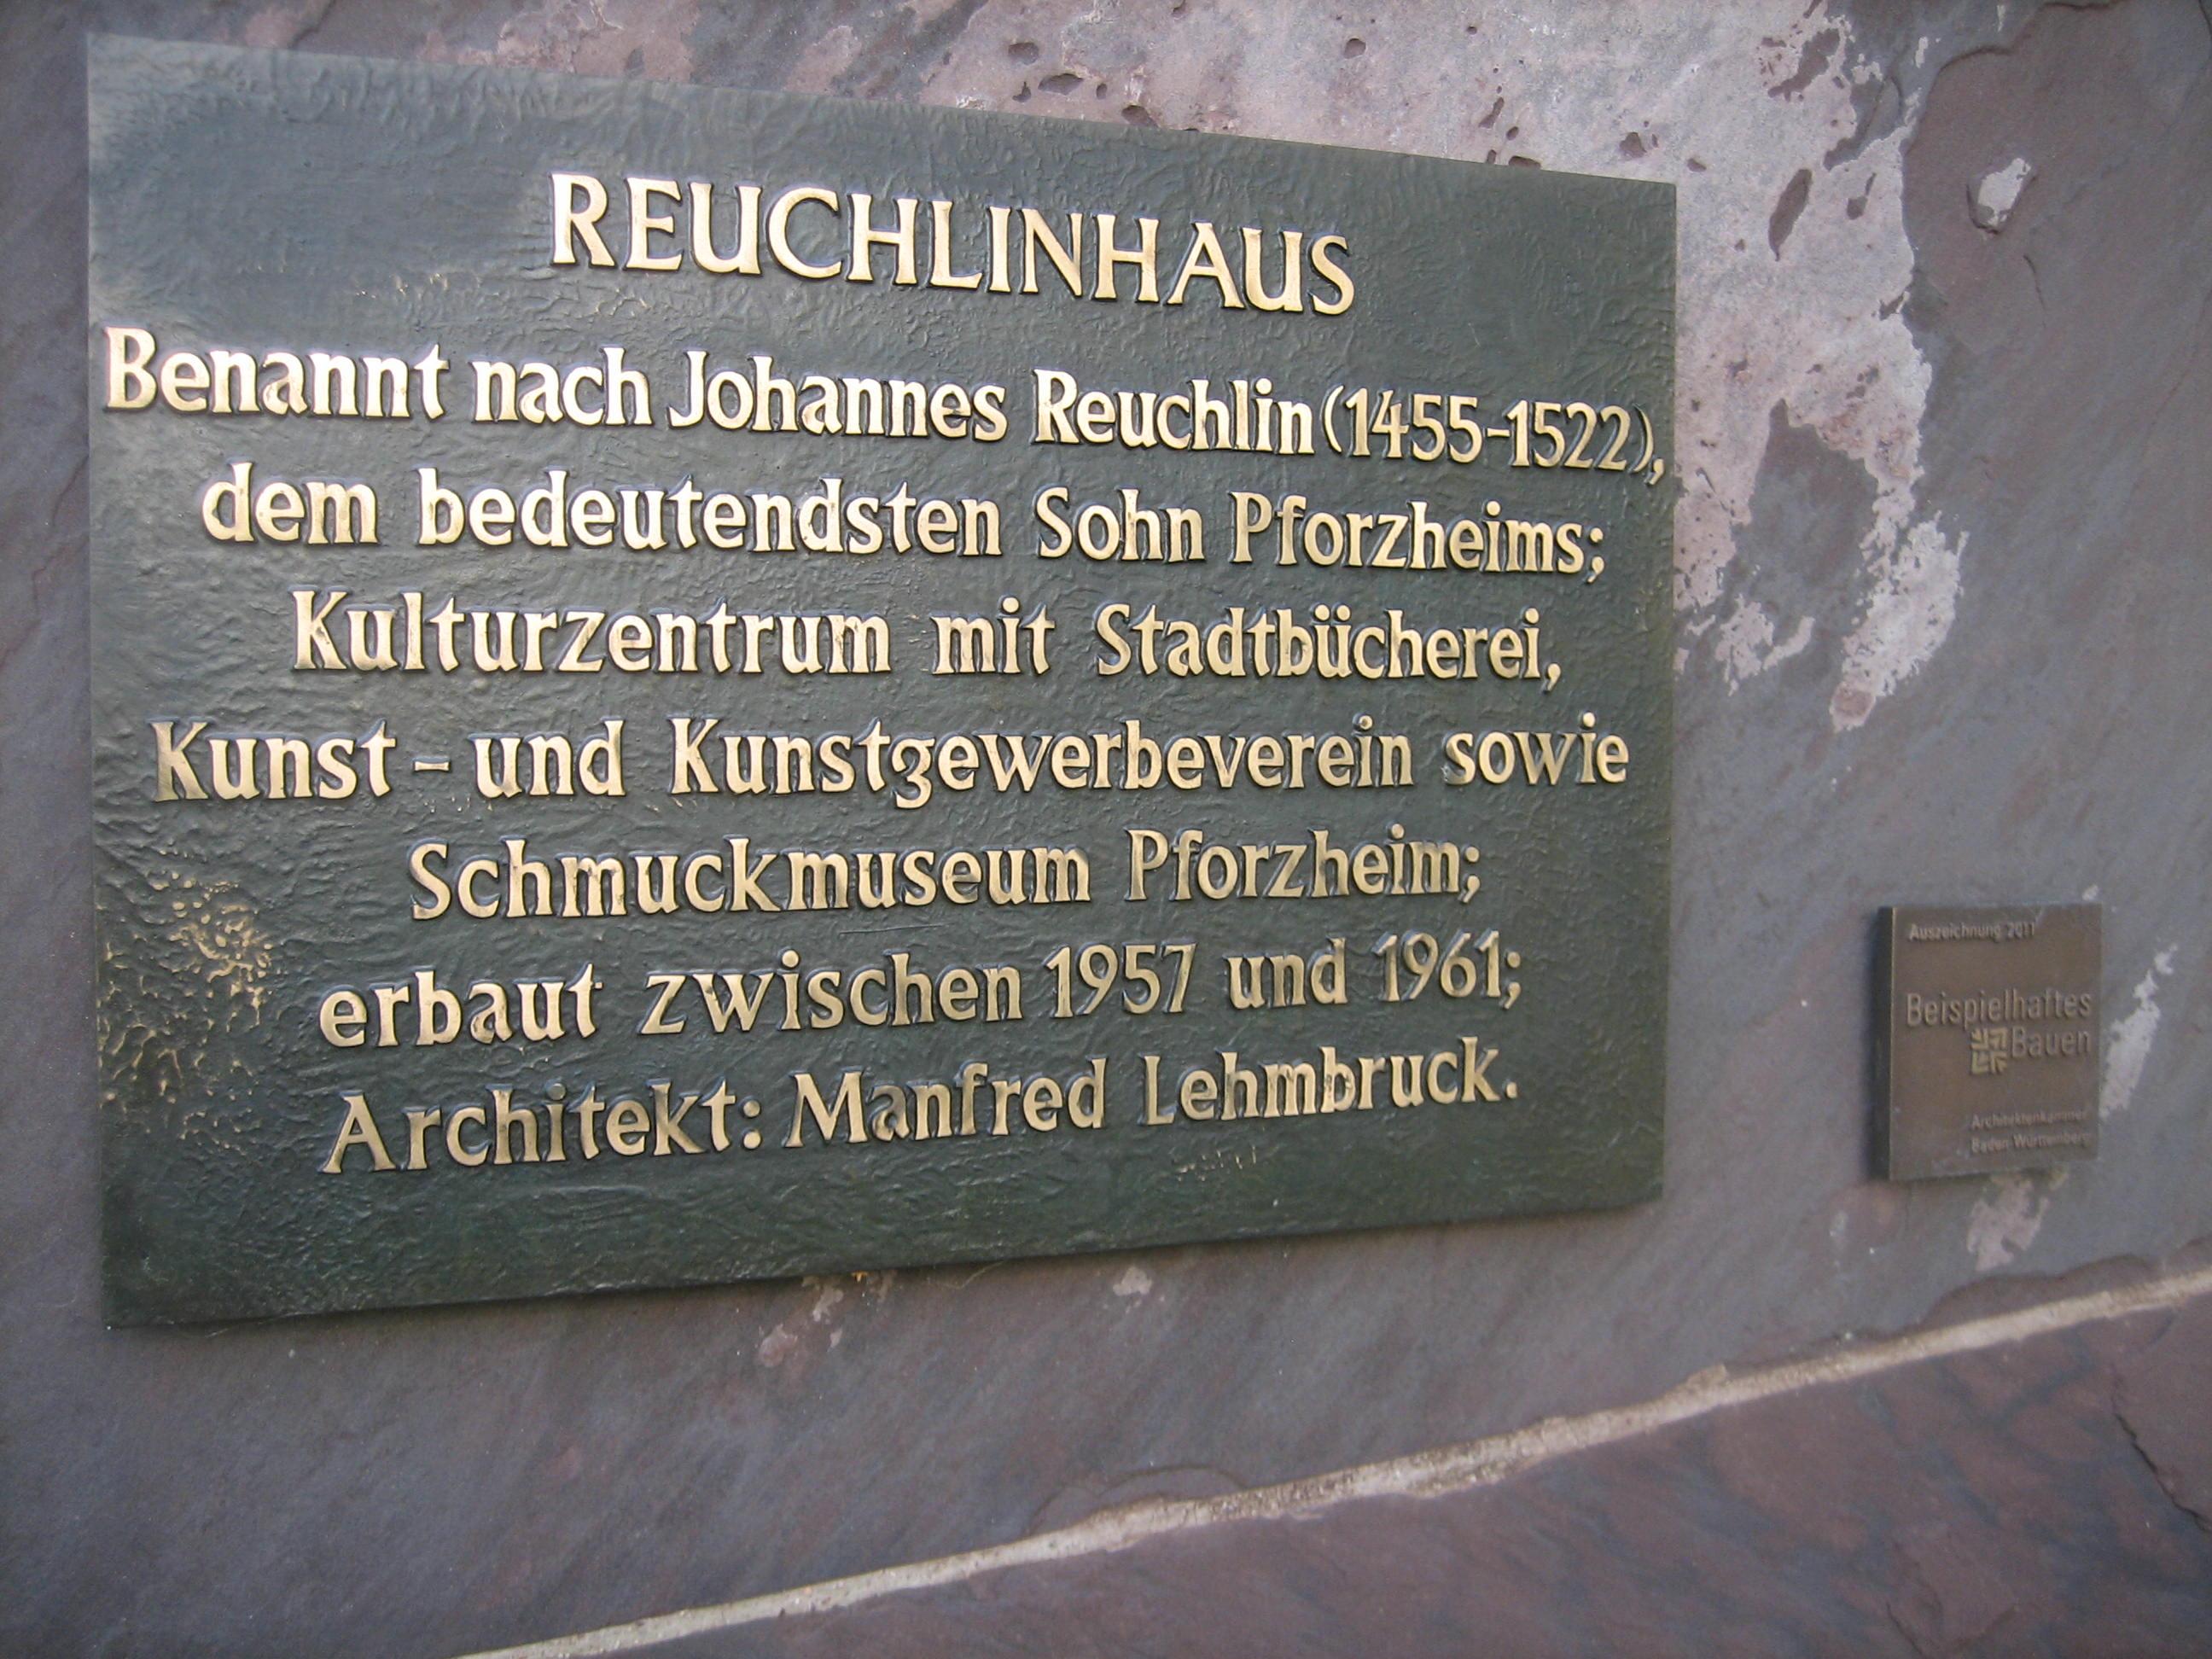 Schmuckmuseum Pforzheim. Foto Esther Doornbusch, september 2018, CC BY 4.0